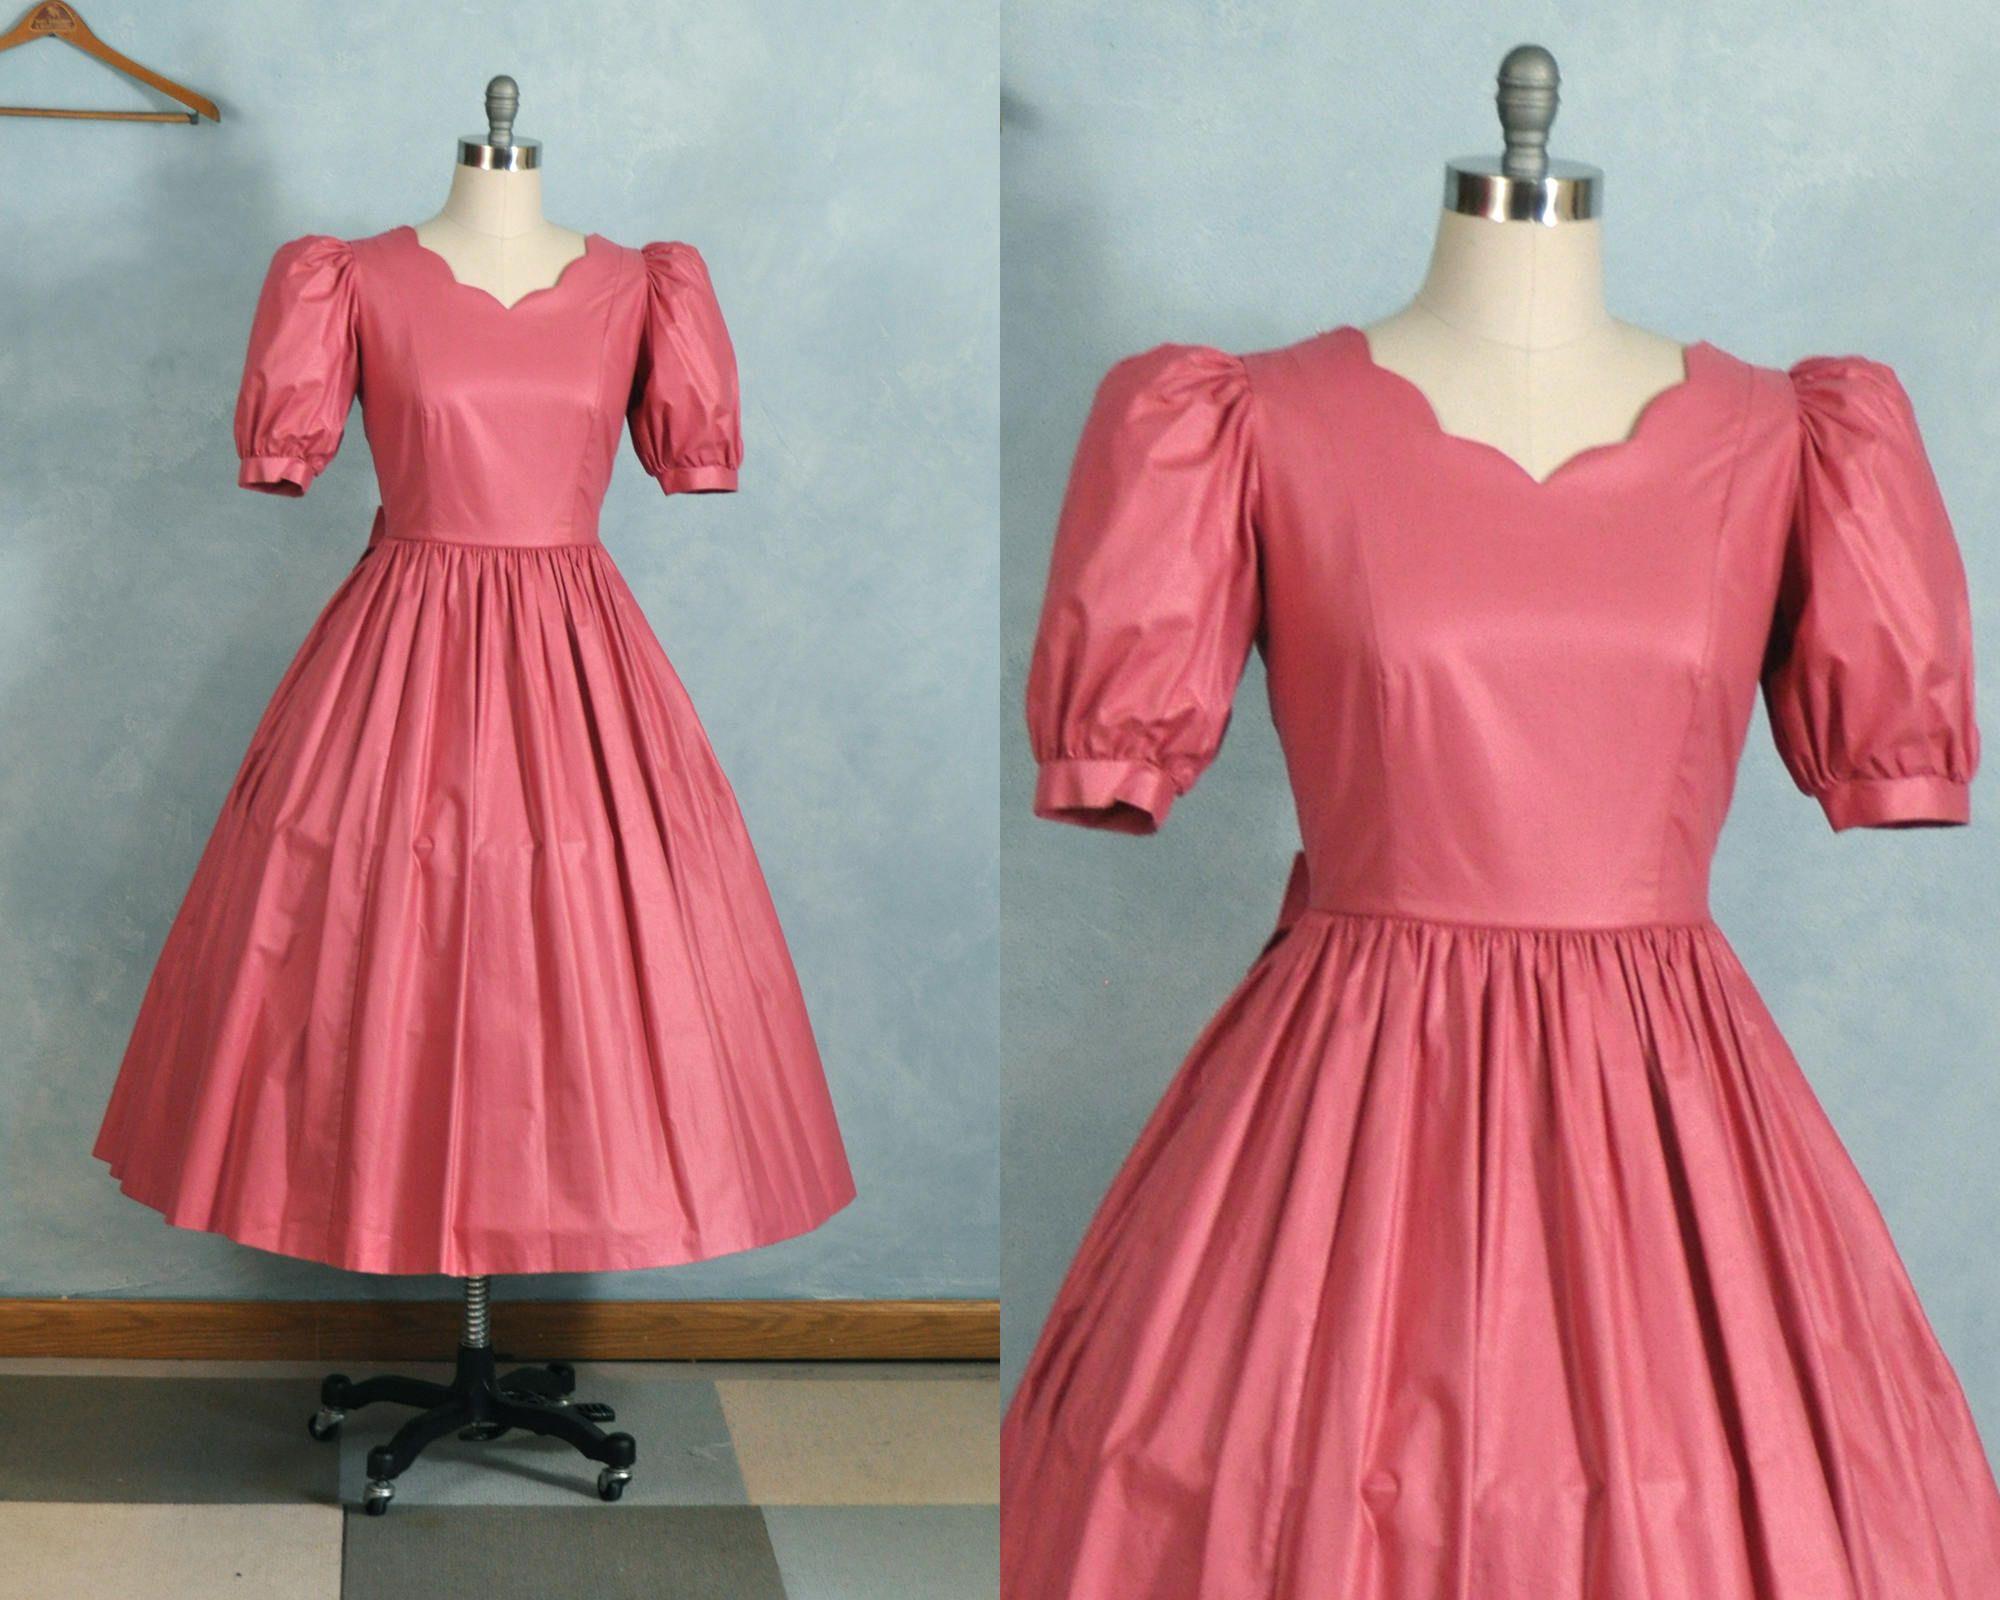 VTG Laura Ashley Dress US 12, UK 16 Pink Cotton Tea Length | Pinup ...